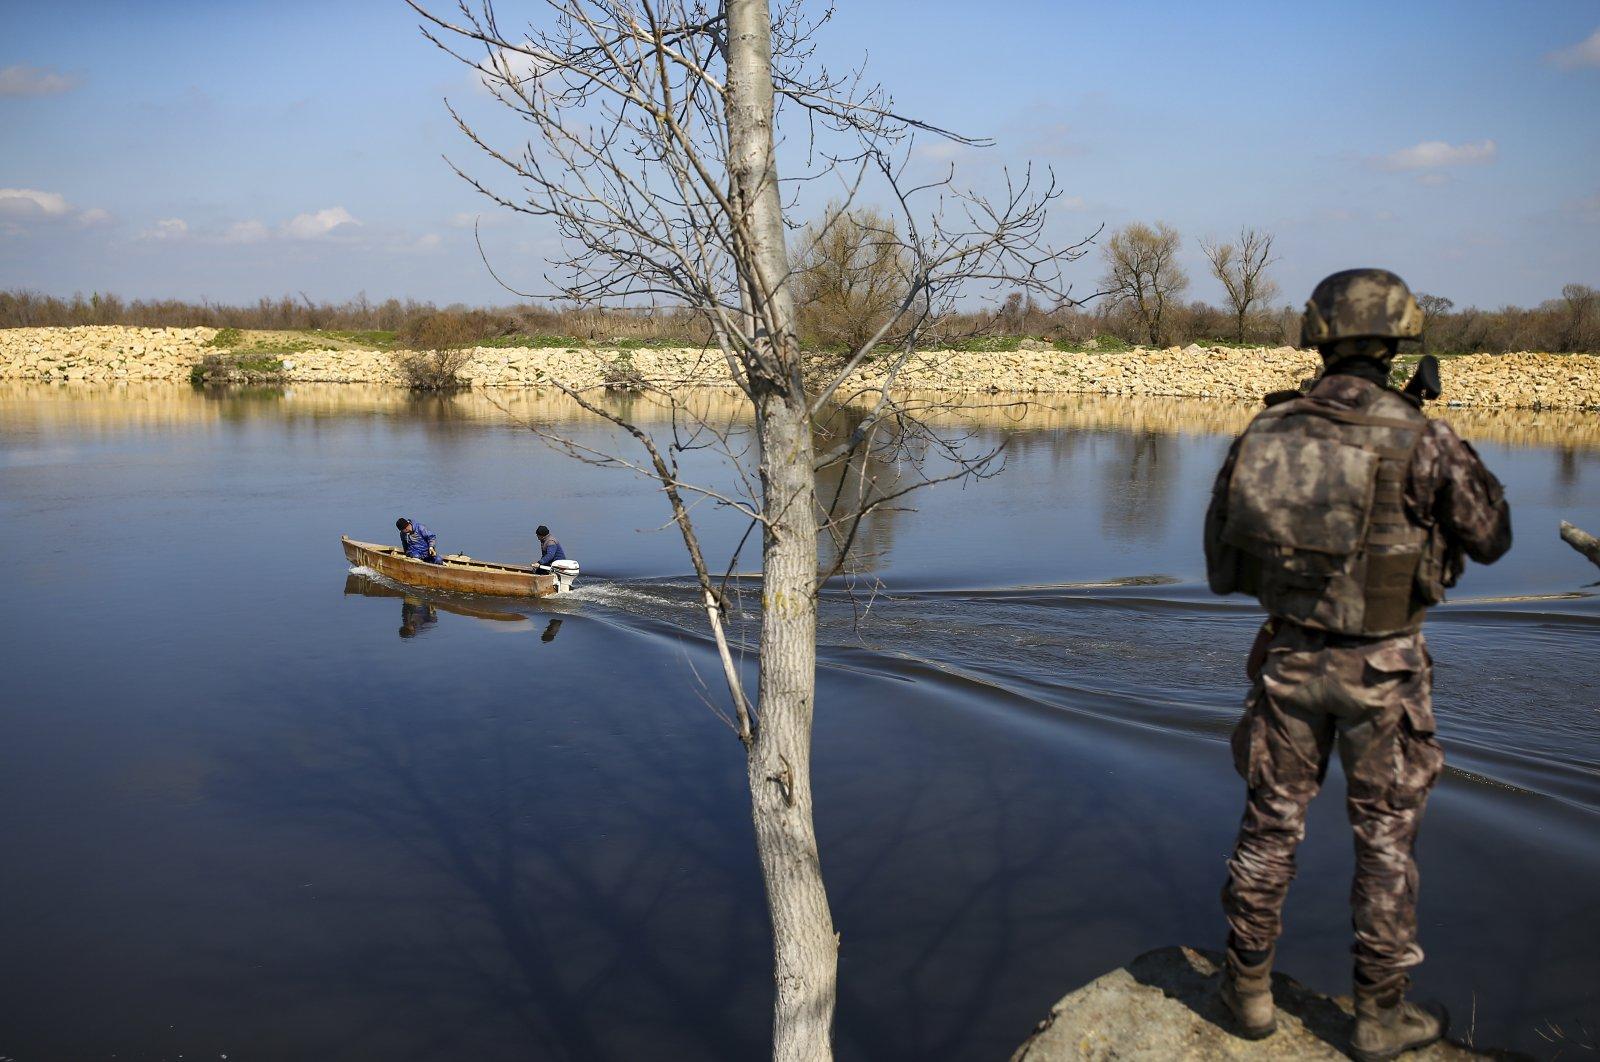 Fishermen sail along the Maritsa river as a Turkish special forces team patrols at the Turkish-Greek border near Karpuzlu village, in Edirne province, northwestern Turkey, March 11, 2020. (AP File Photo)